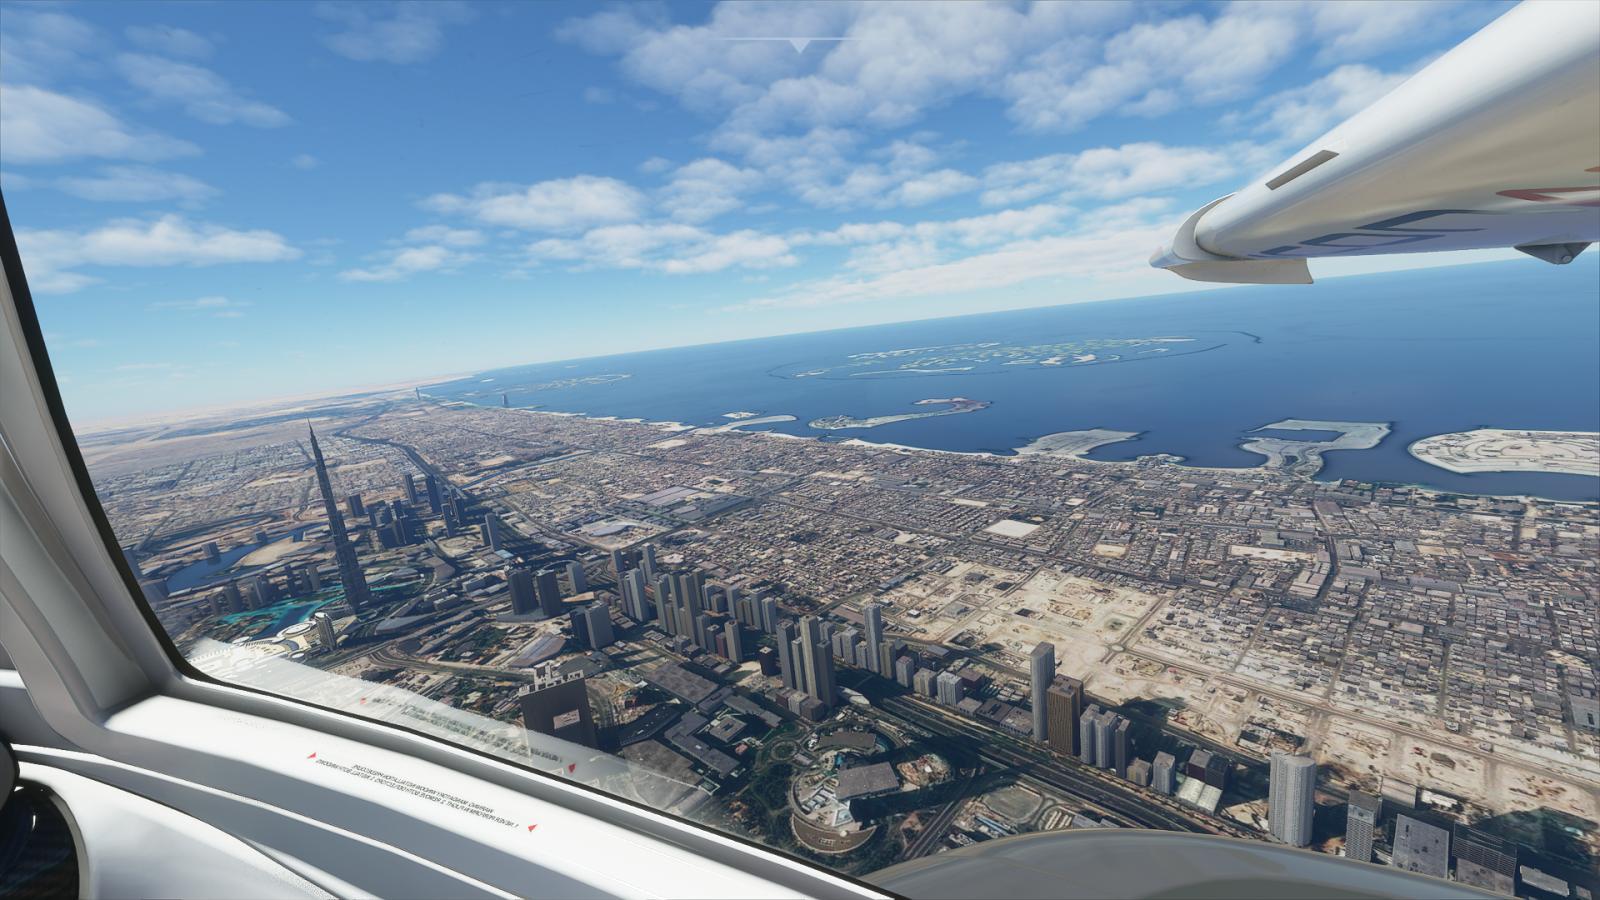 İsim:  Microsoft Flight Simulator Screenshot 2020.08.20 - 22.30.21.99.jpg Görüntüleme: 124 Büyüklük:  206.5 KB (Kilobyte)